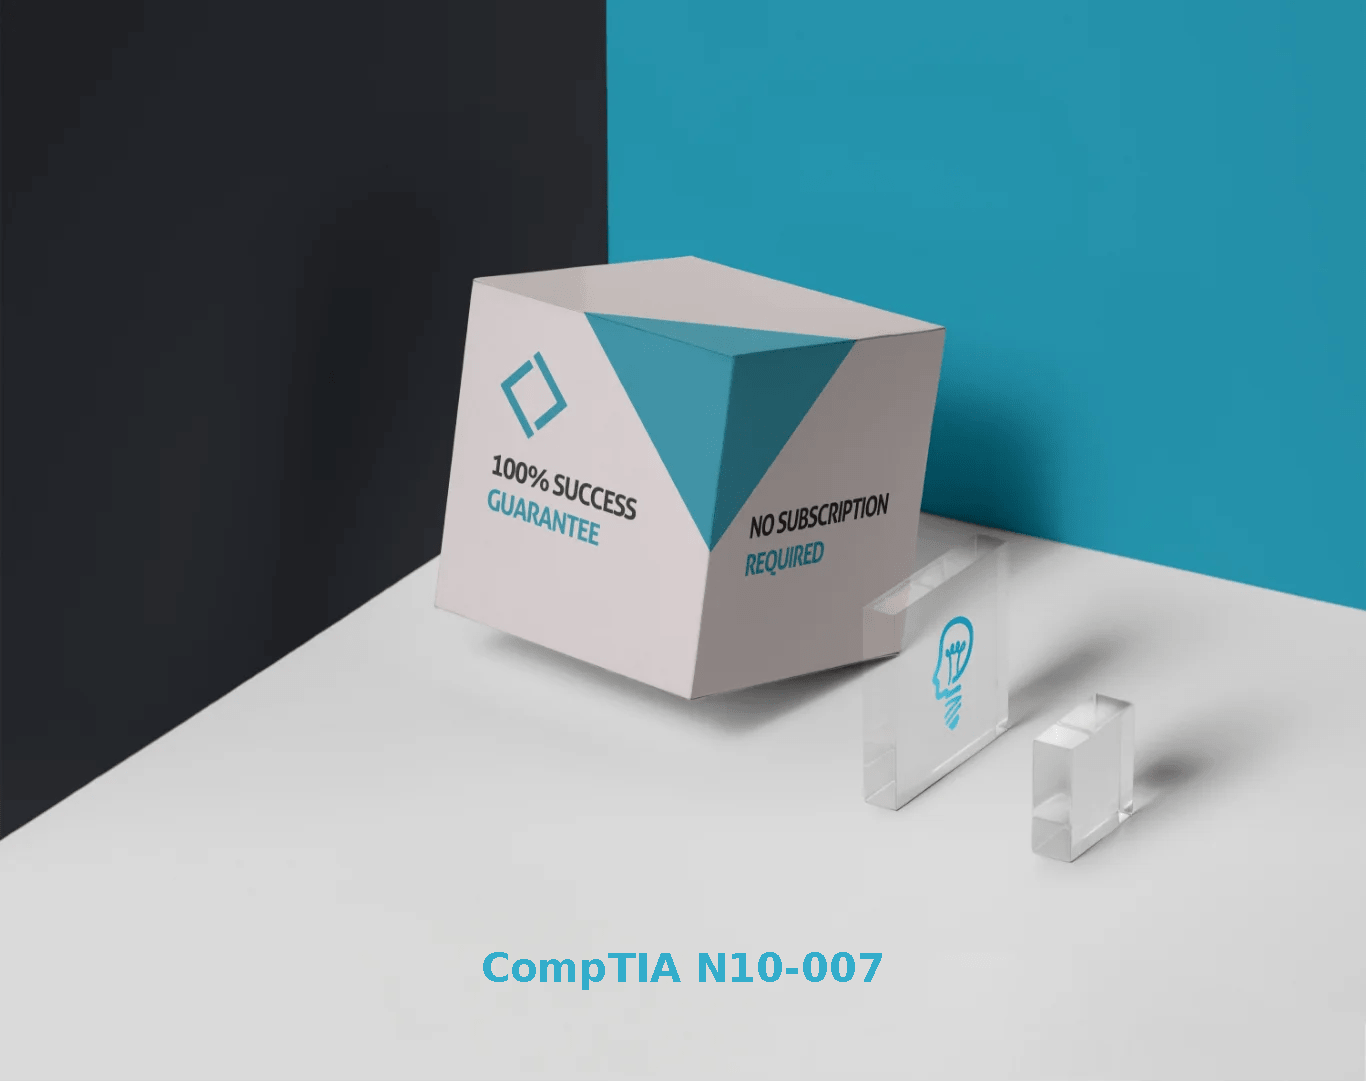 CompTIA N10-007 Exams